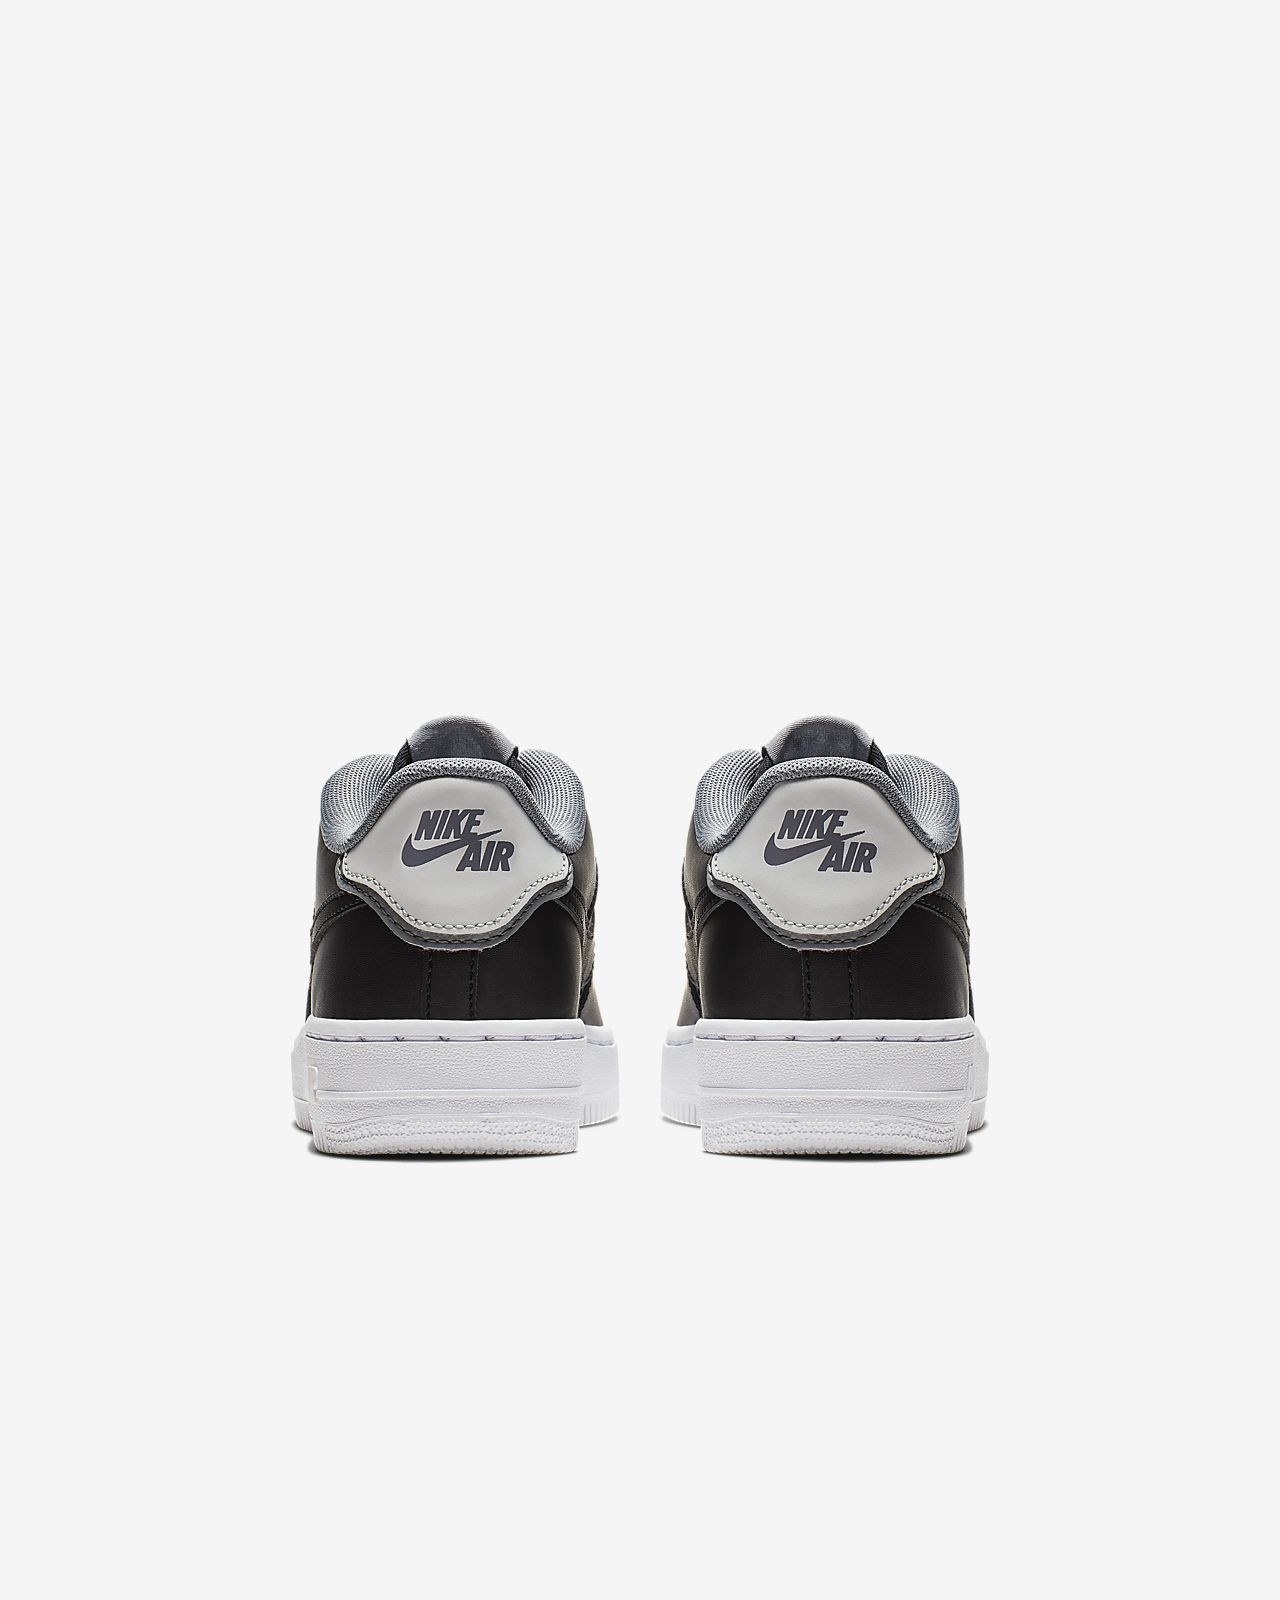 super popular 96b84 e8cfc ... Nike Air Force 1 LV8 1 DBL Big Kids  Shoe